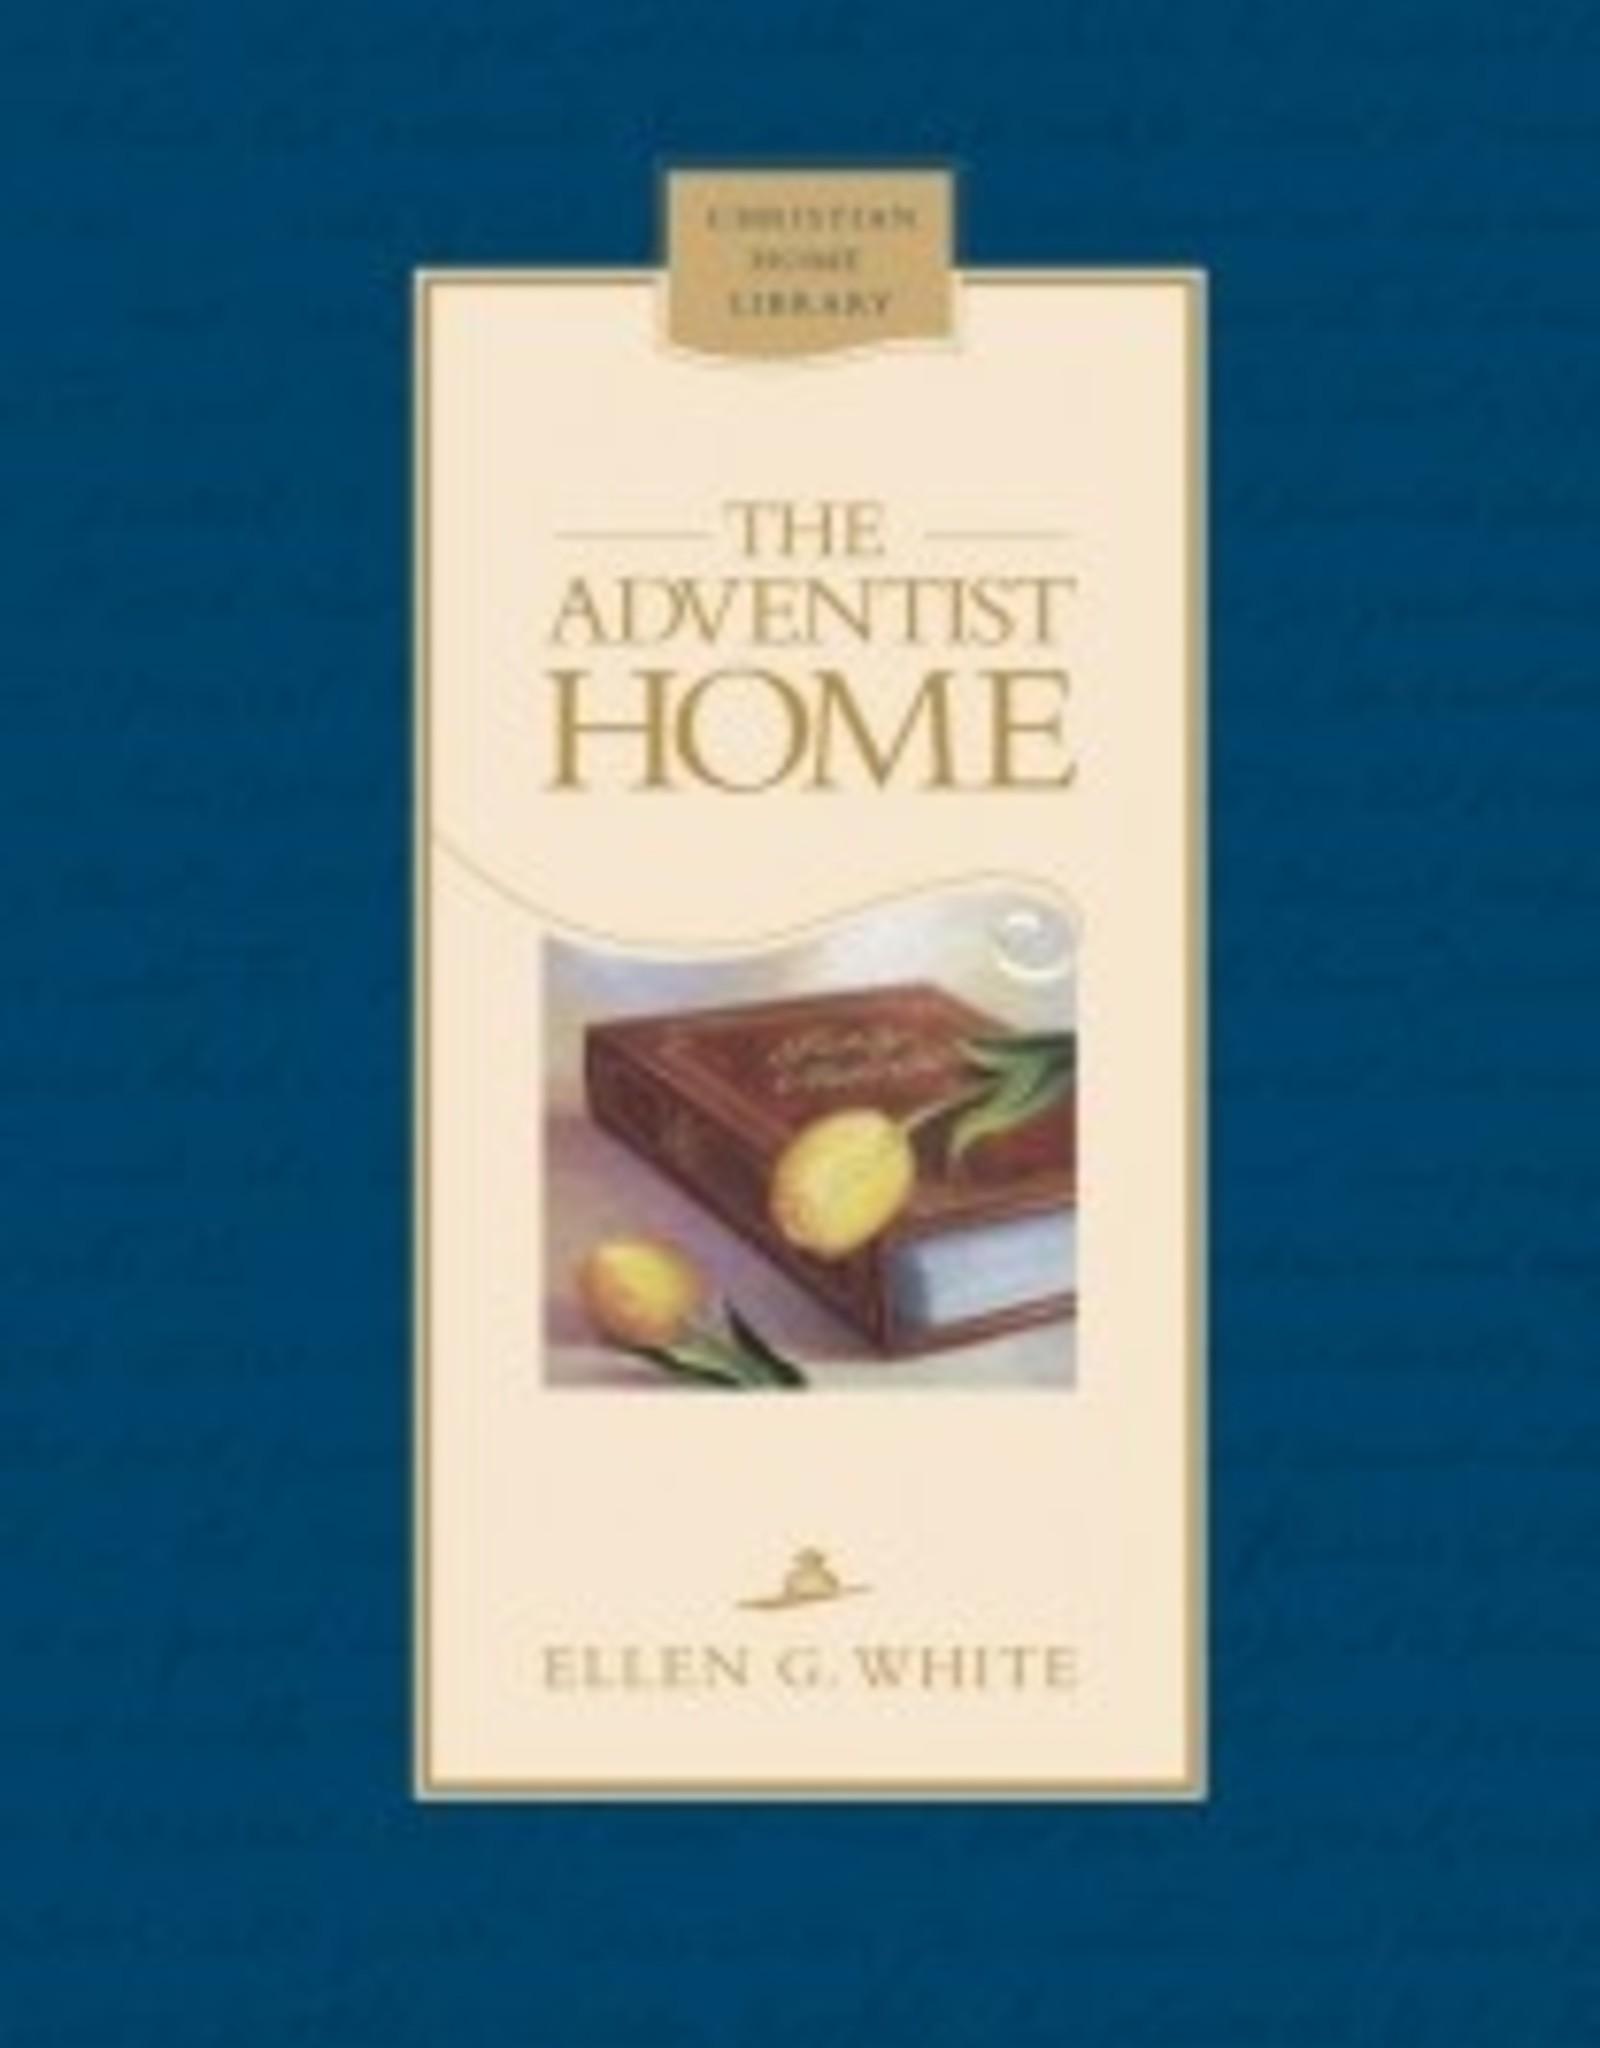 Ellen G.White The Adventist Home (hard cover)